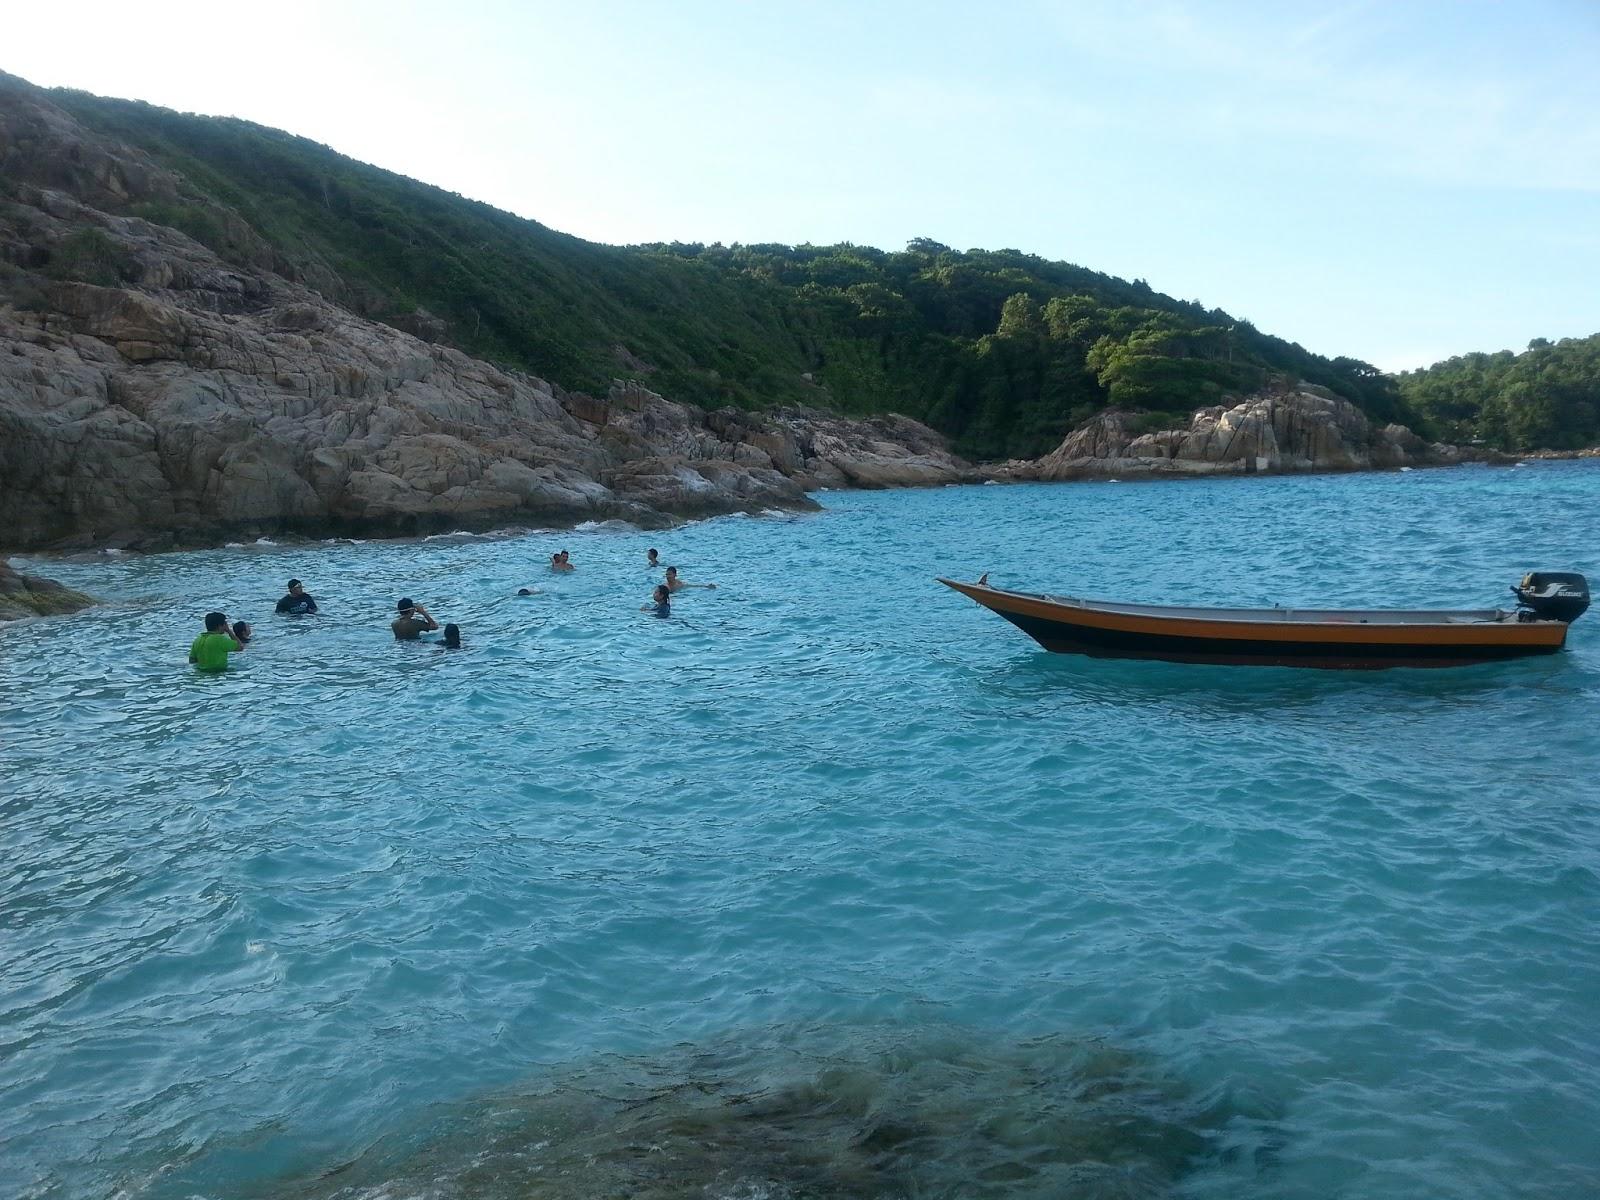 Chalet pulau perhentian kecil 2013